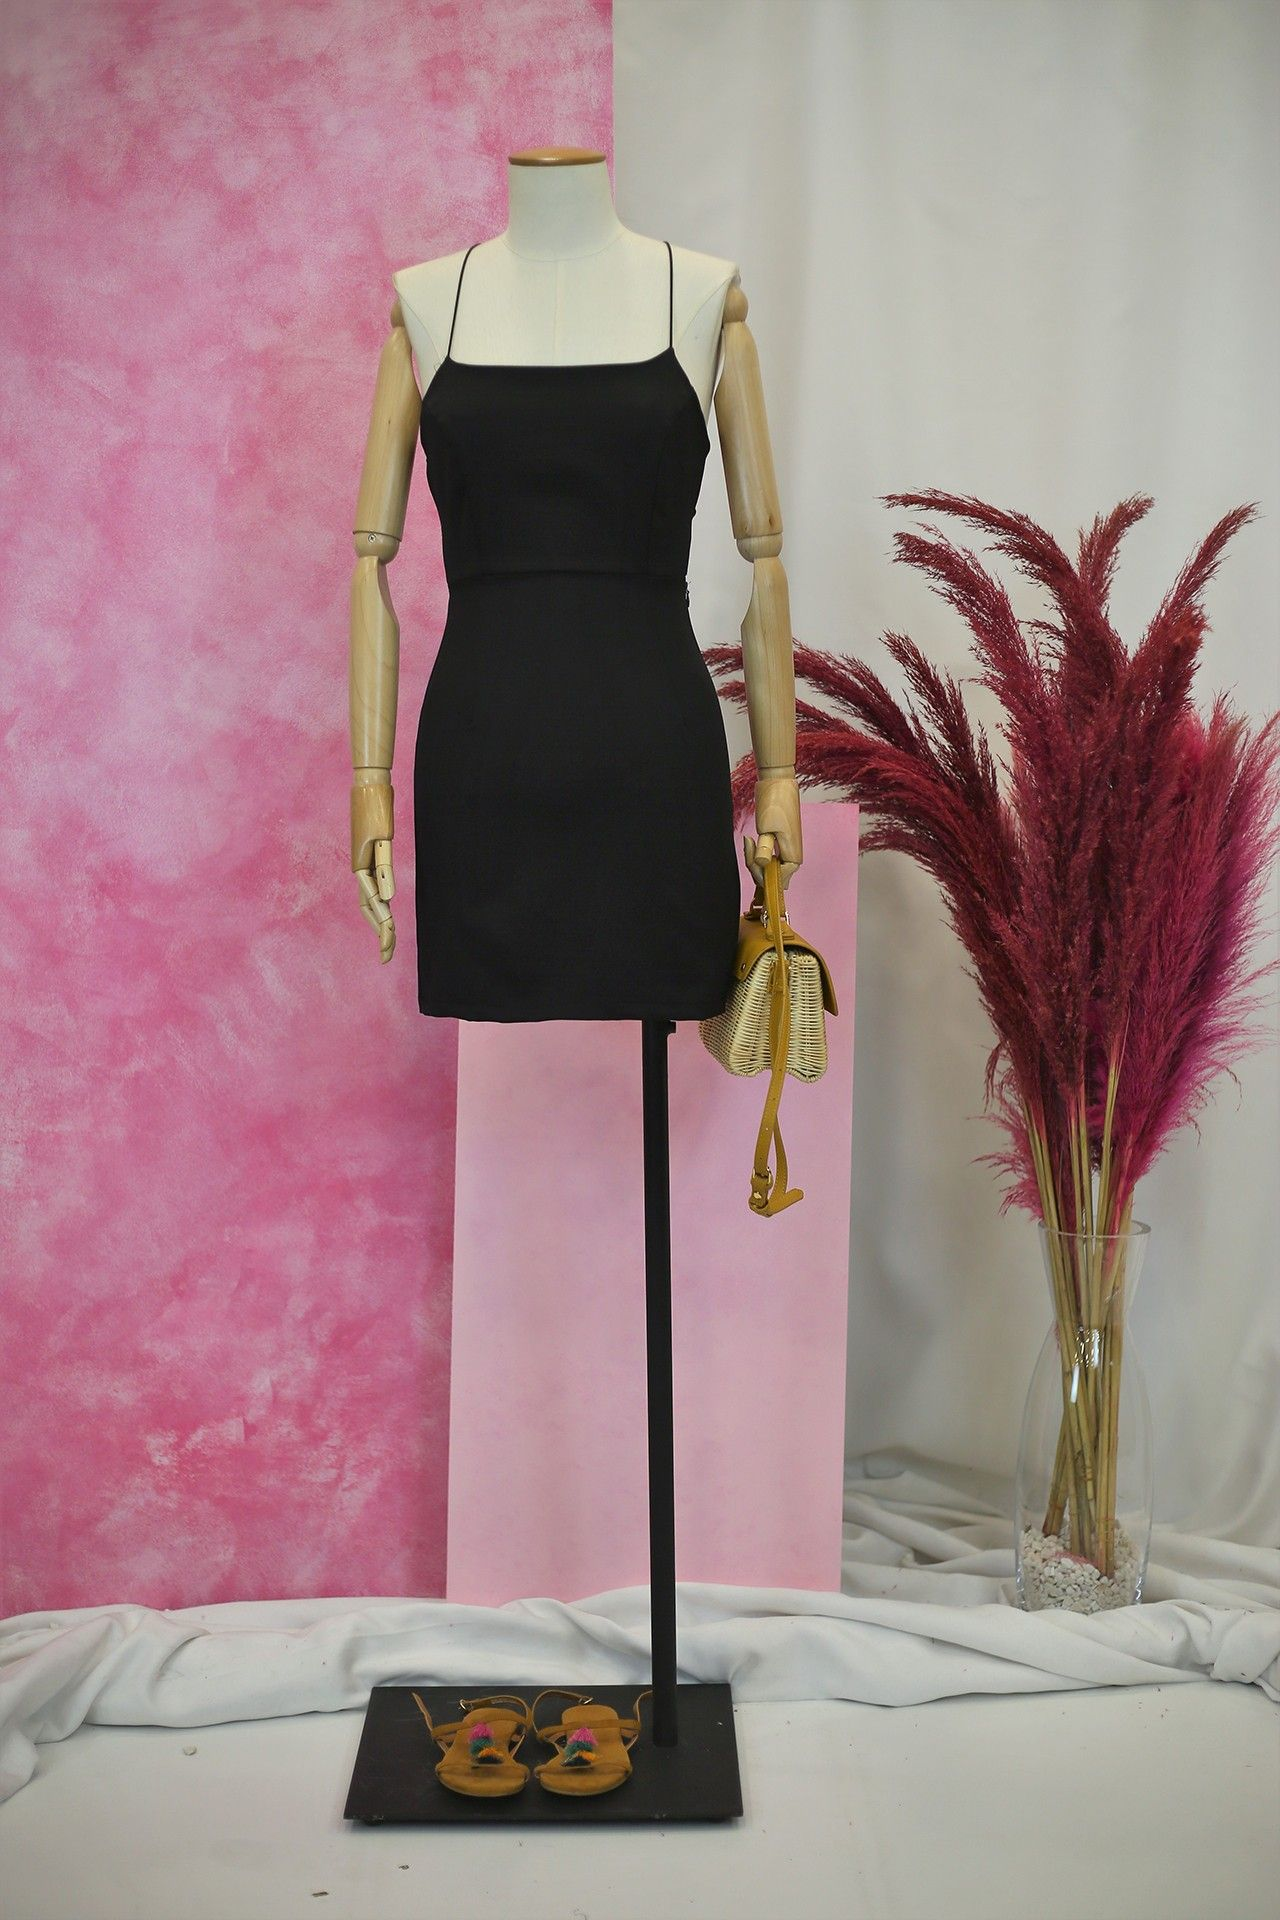 Ince Askili Siyah Mini Elbise 99 9 Ince Askili Siyah Mini Elbise Mini Elbise Elbise Sari Elbise